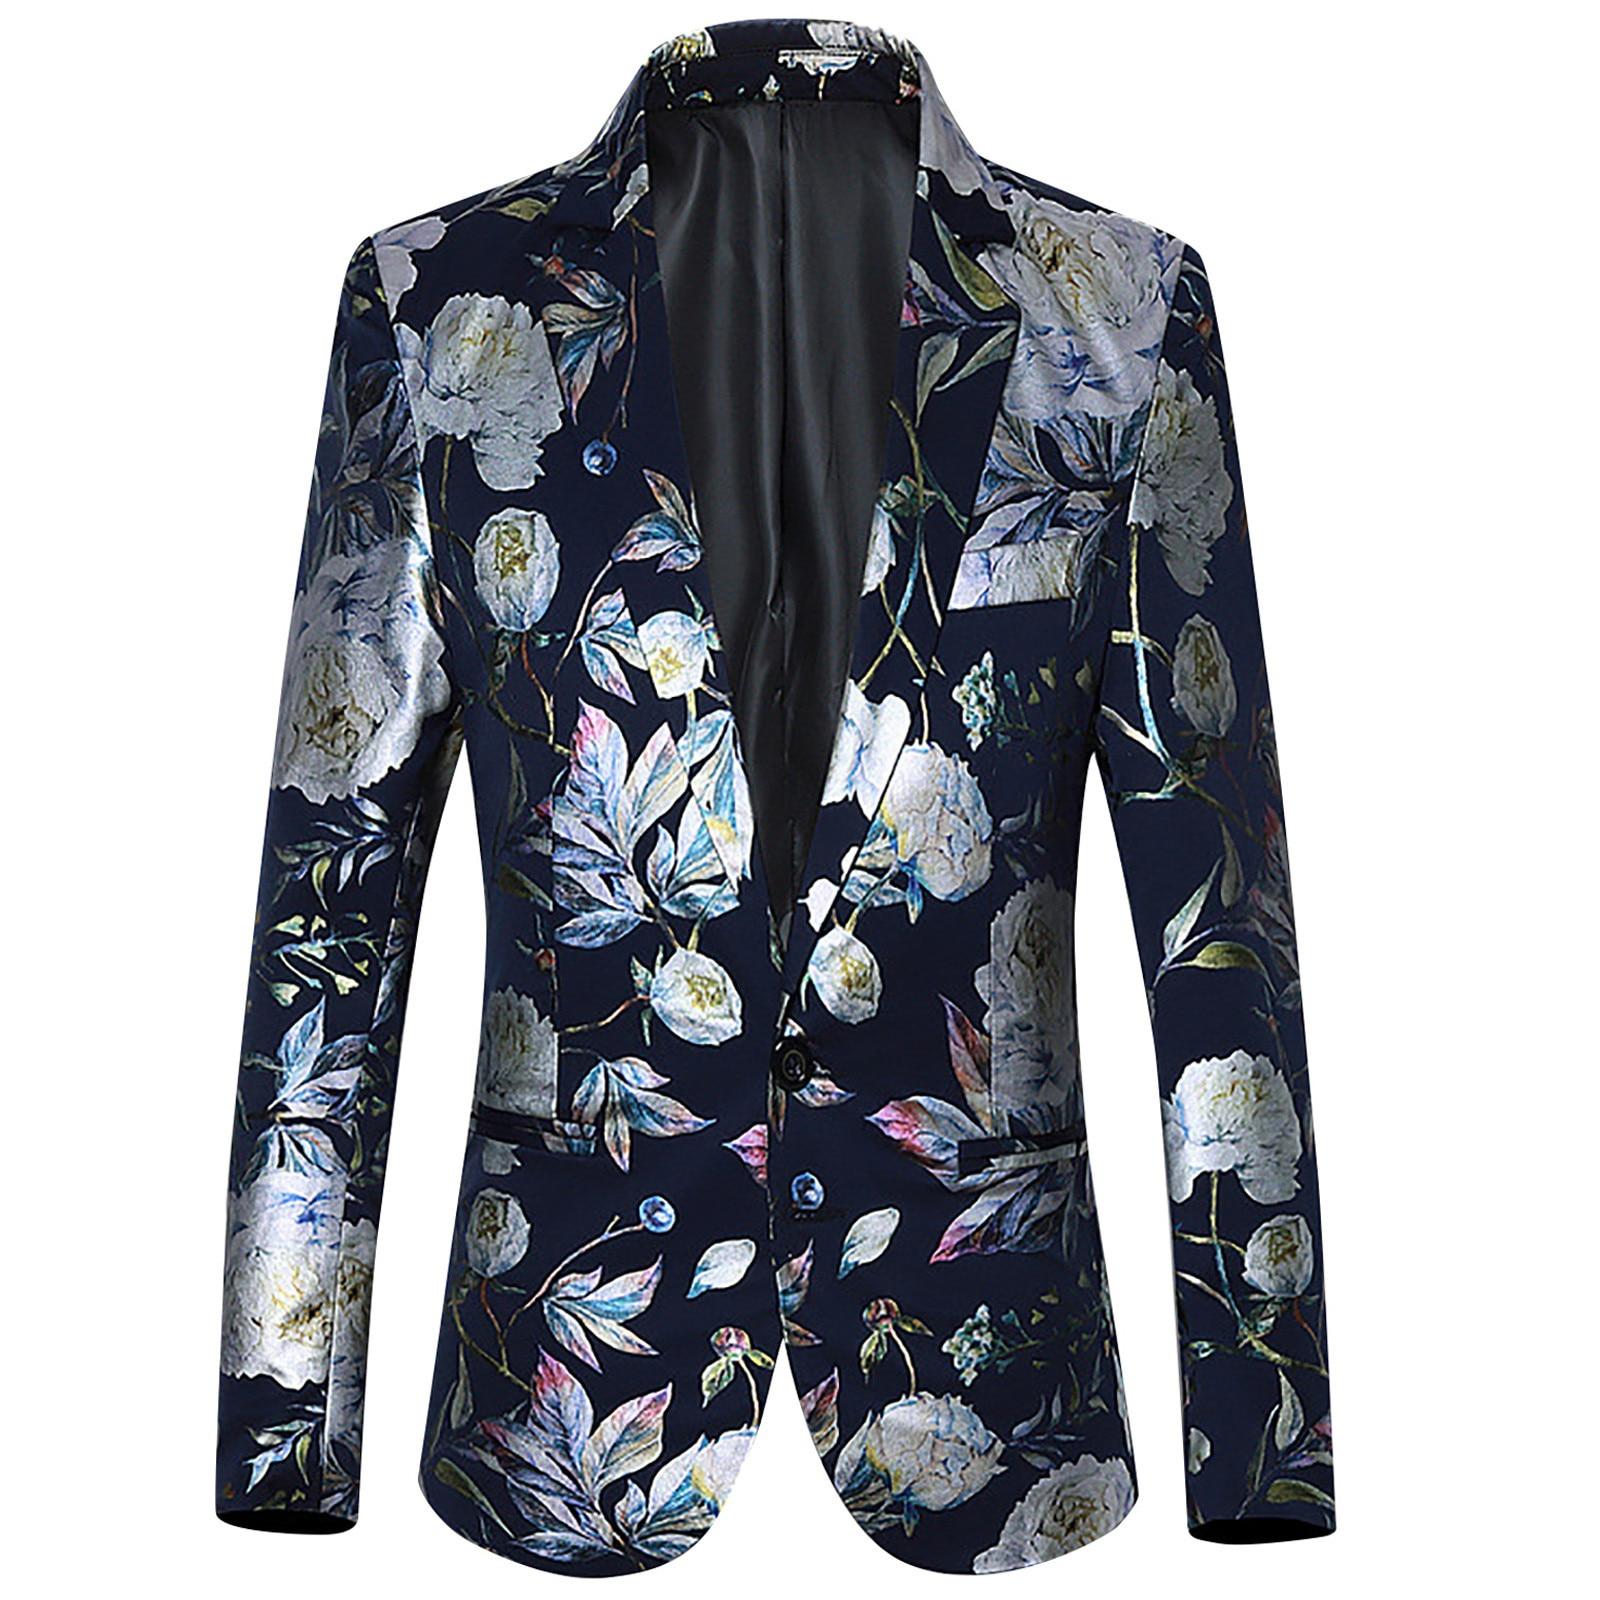 Designer Men's Blazer Fashion Men's Golden Tulip Pattern Print Blazer Jacket Double Breasted Men's W